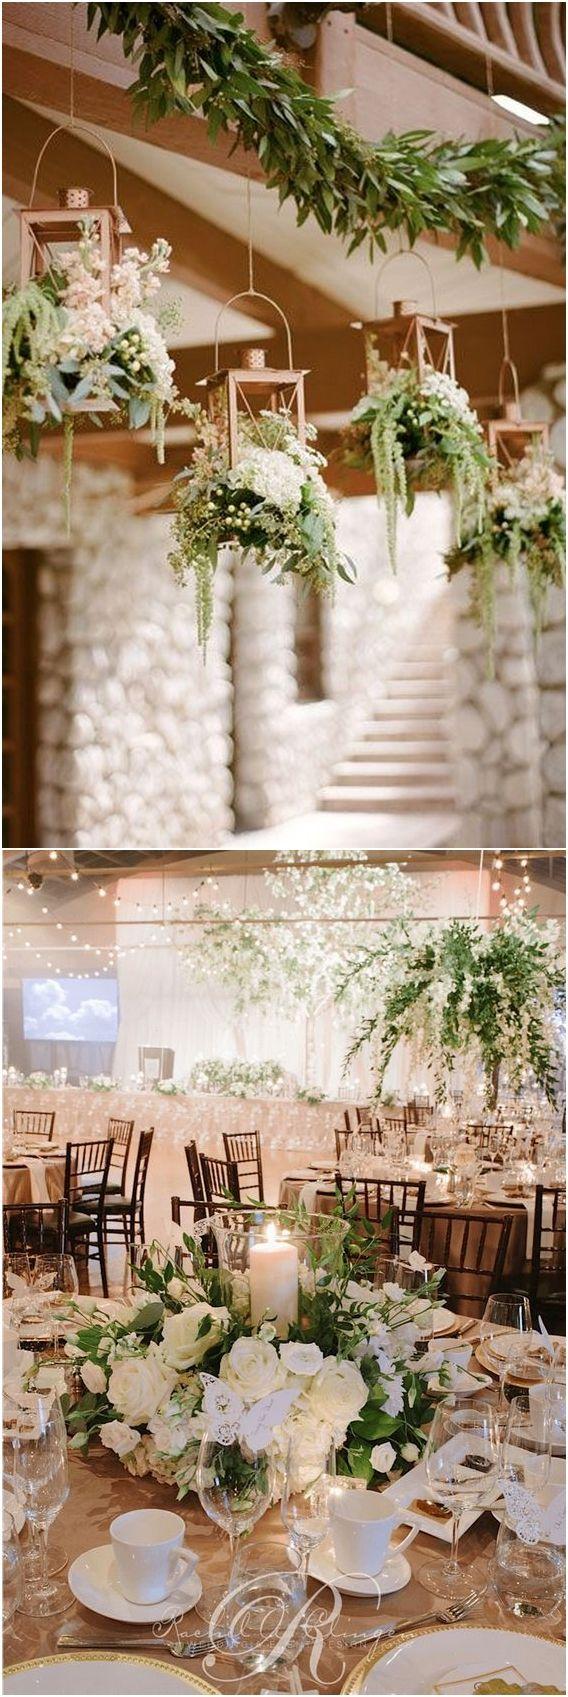 Wedding Trend: Greenery Wedding Color Ideas #green #greenwedding